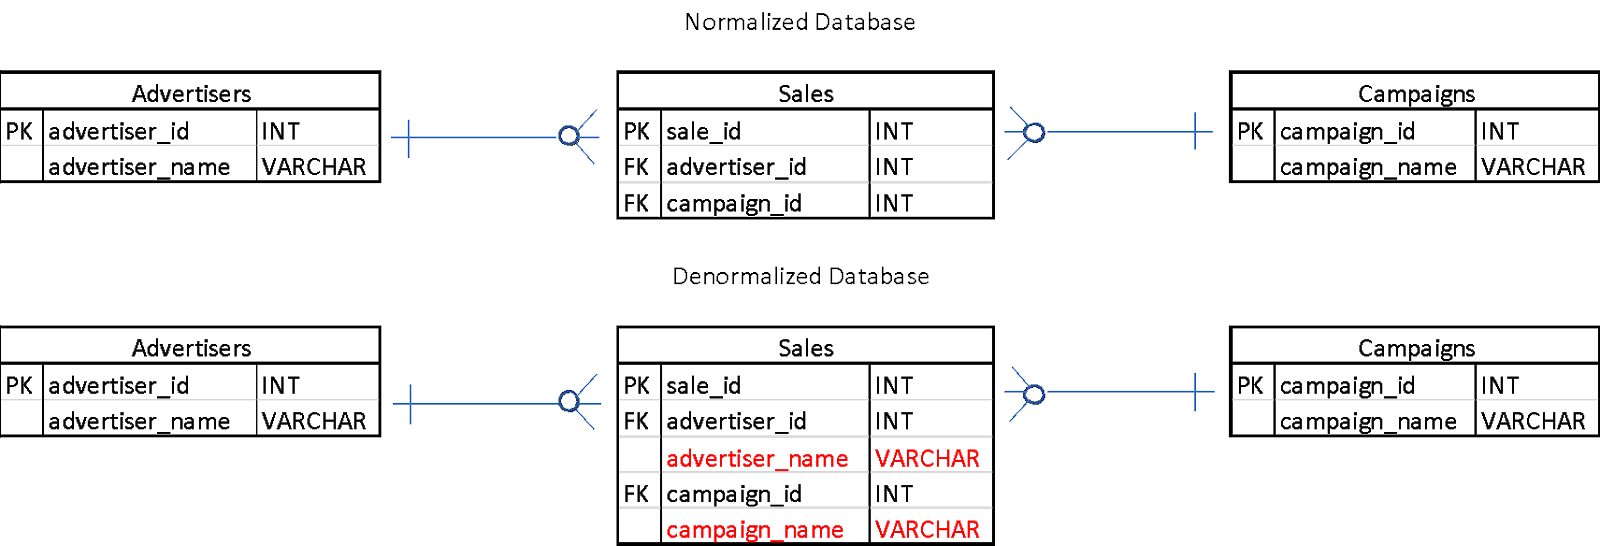 Normalized database vs denormalized 2